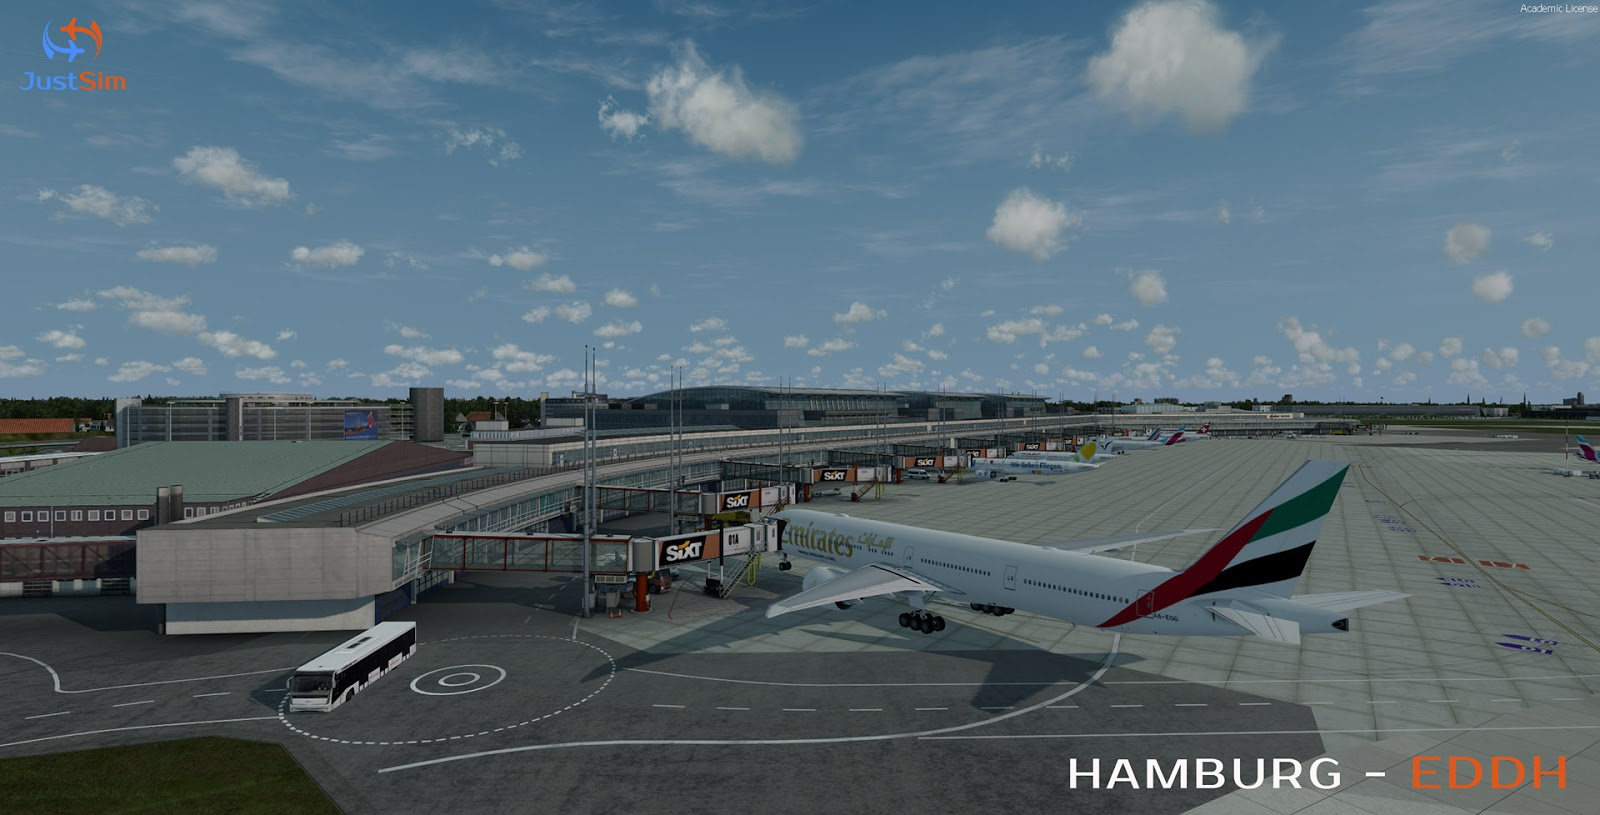 P3D] JUSTSIM - HAMBURG AIRPORT - HELMUT SCHMIDT - EDDH - Master Addons